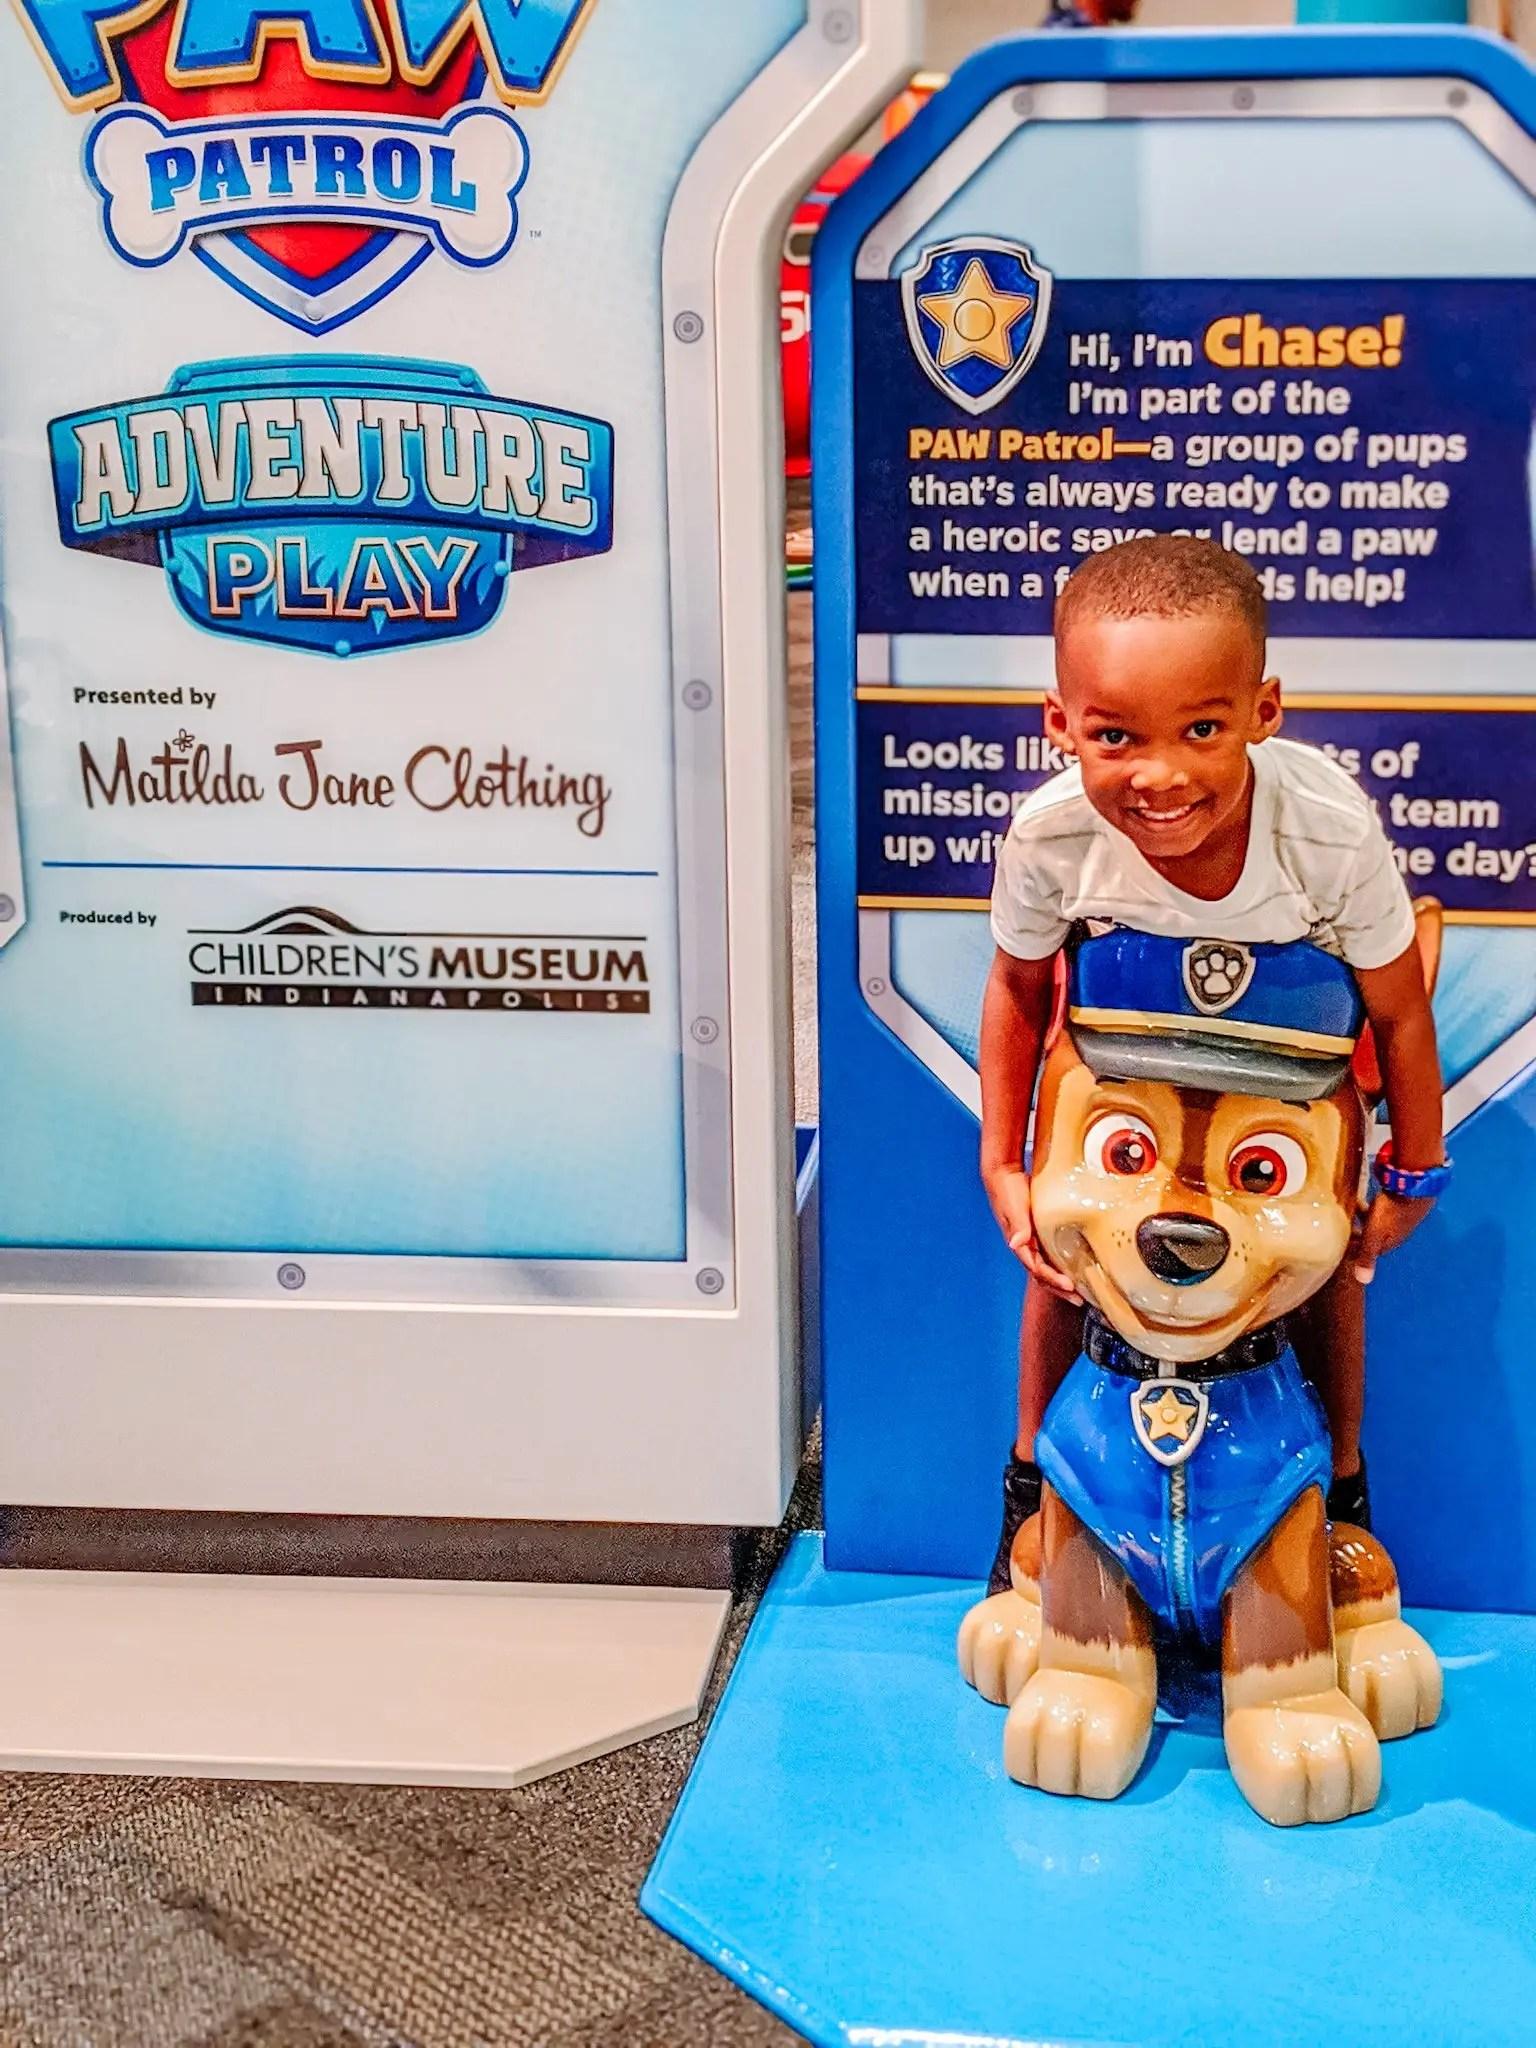 Preschool Black boy with Chase of the Paw Patrol